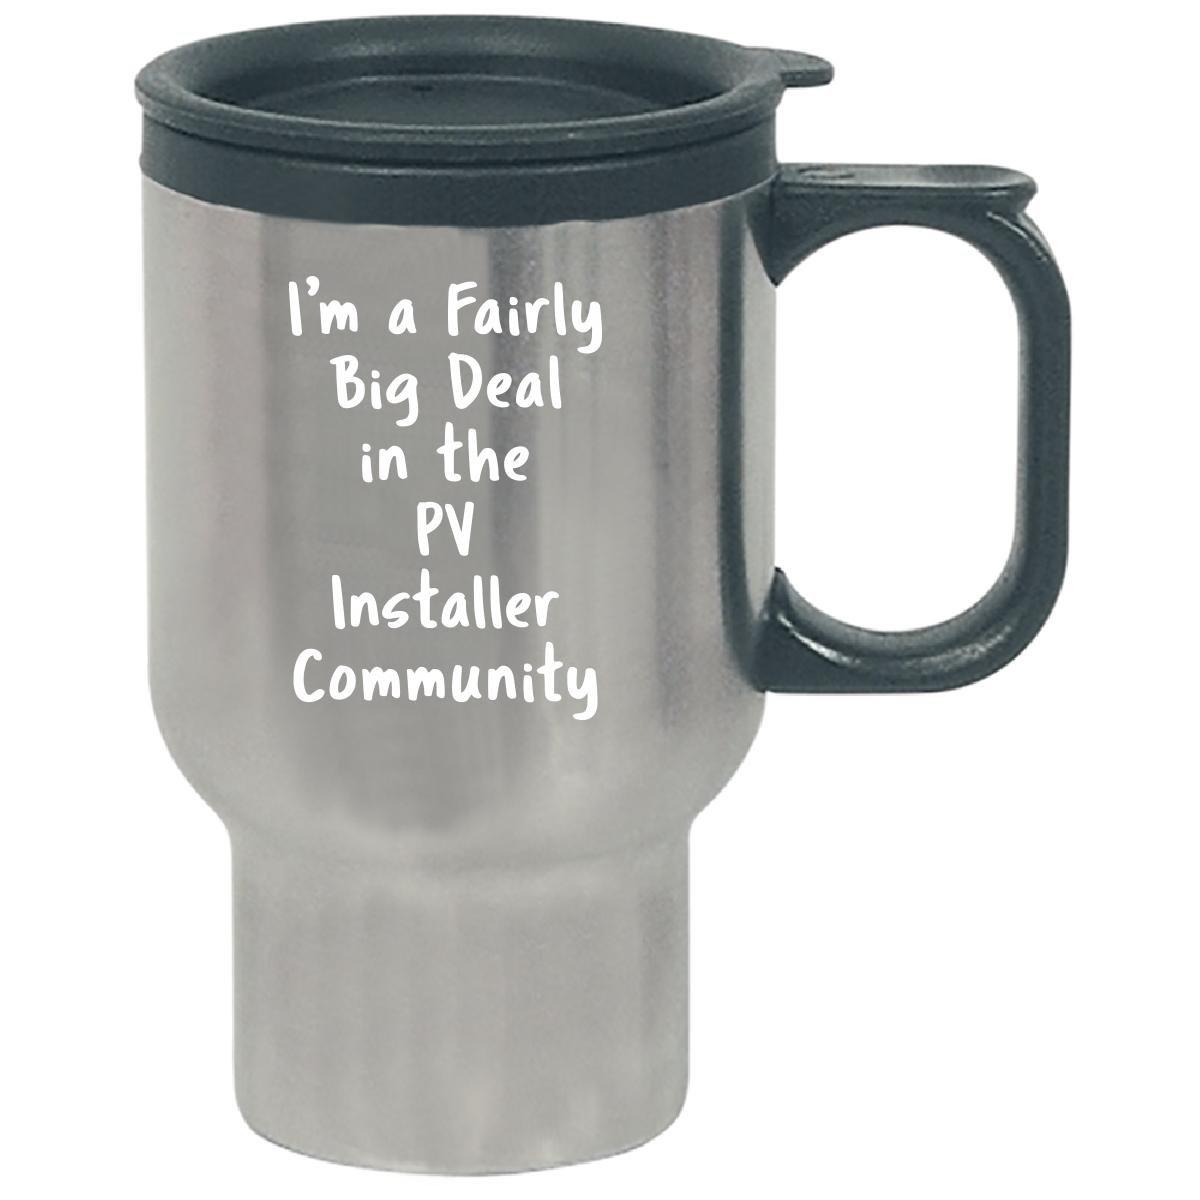 Pv Installer Big Deal Sarcastic Funny Saying Solar Job Gift - Travel Mug